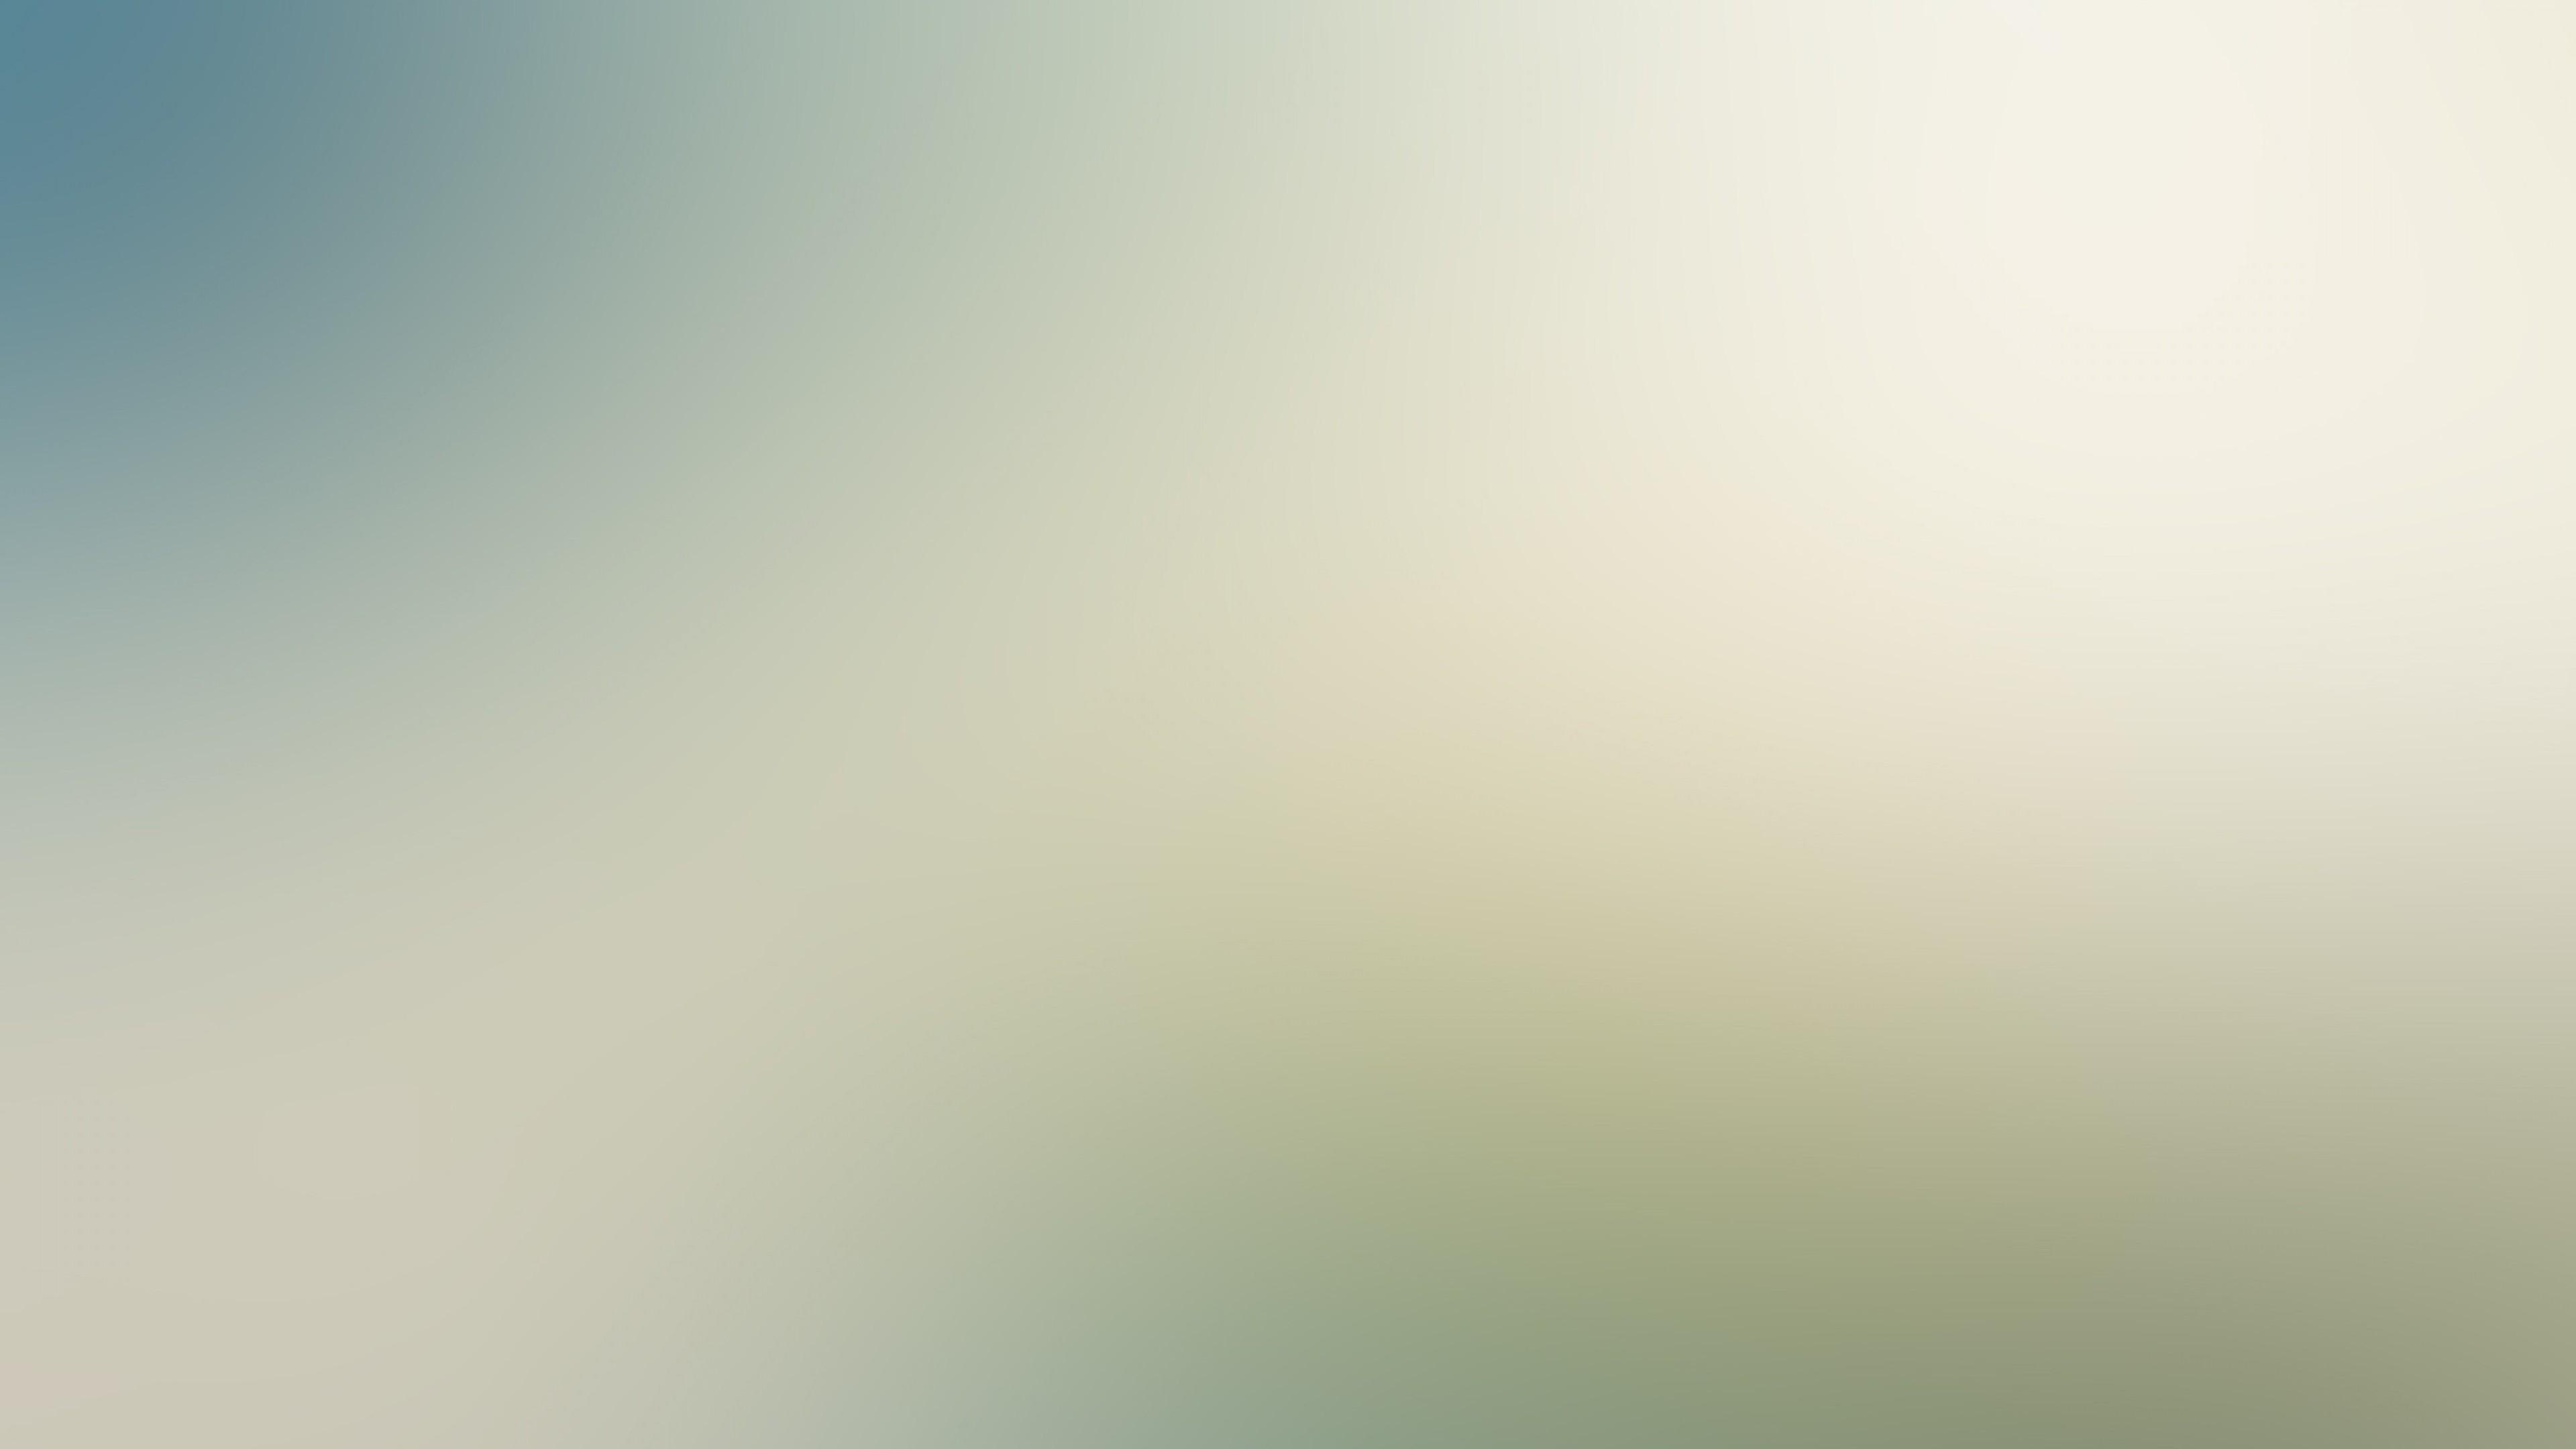 Wallpaper light, faded, background